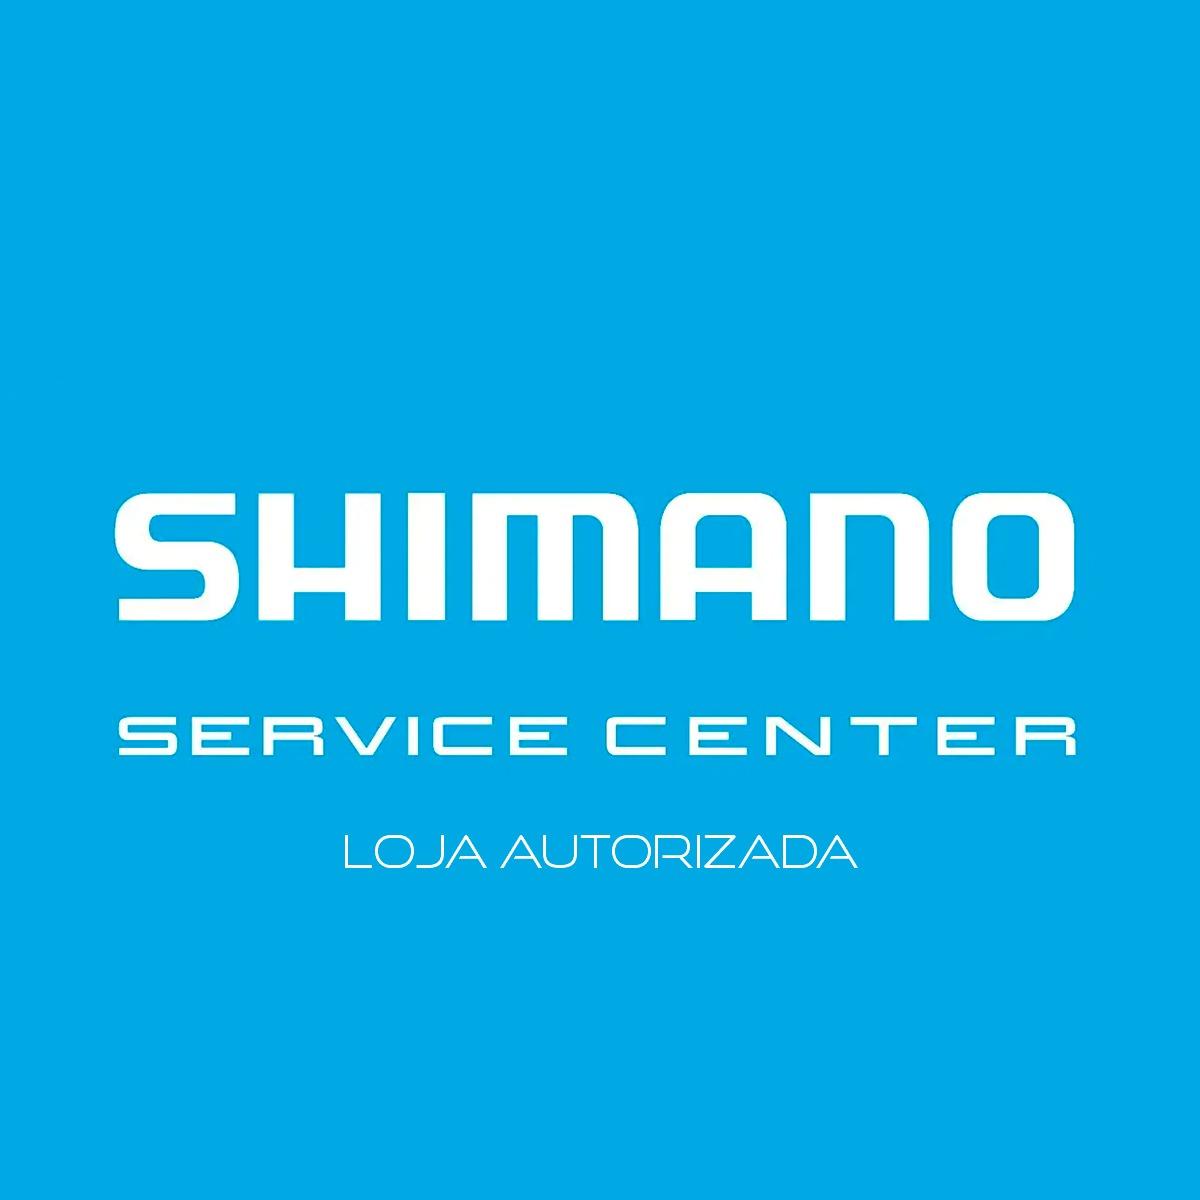 Pastilha de Freio Shimano G02S Resina c/ Mola Deore, SLX, XT